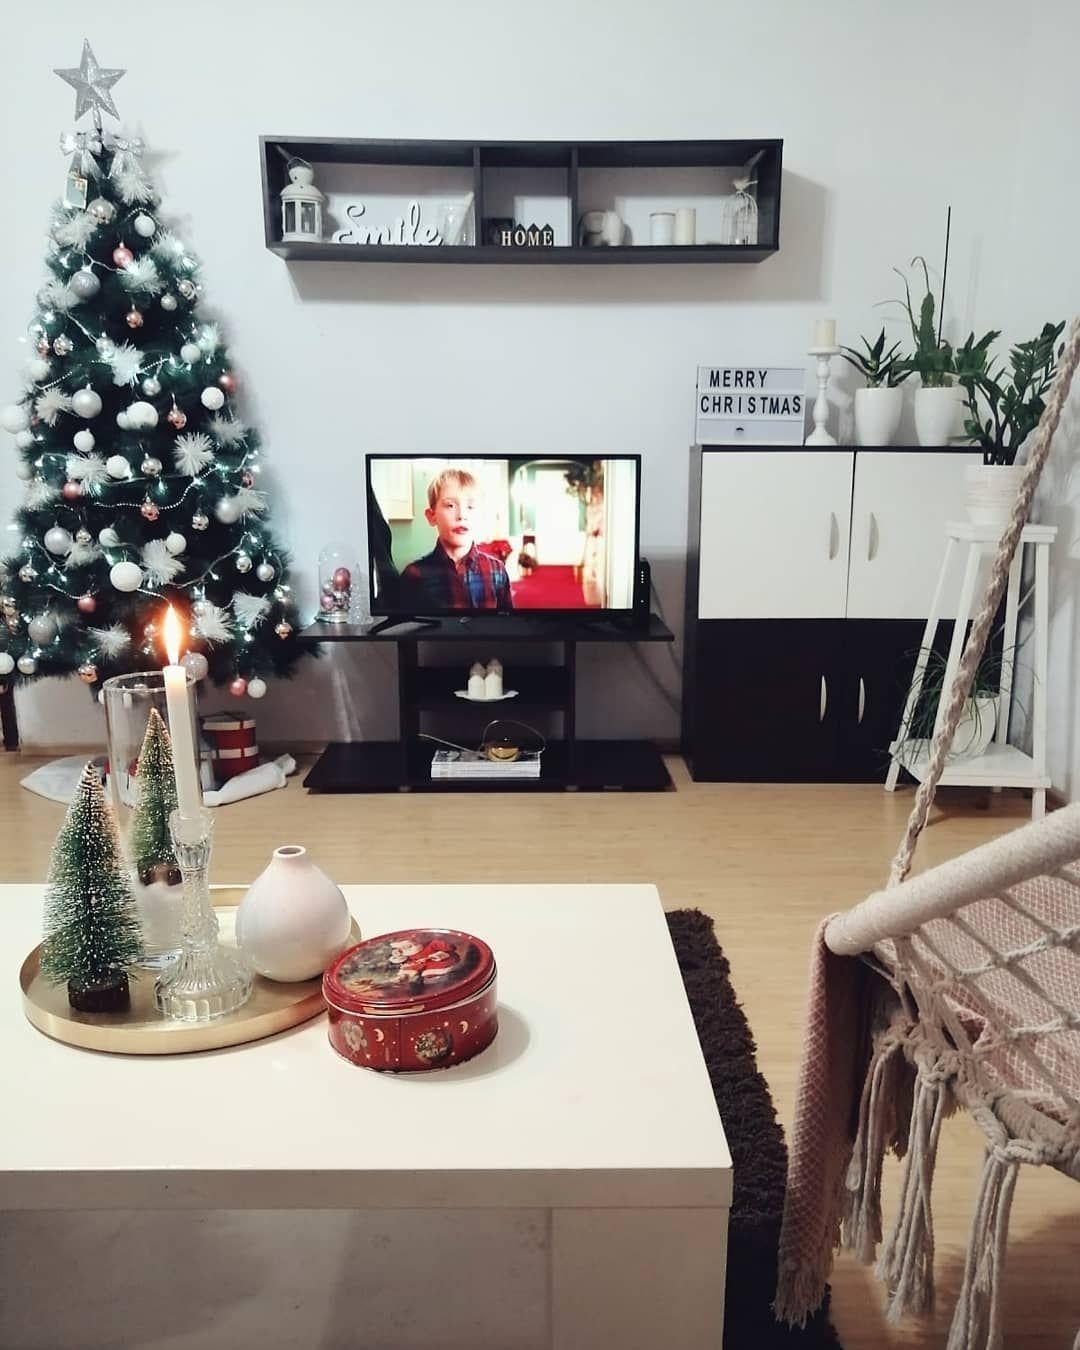 Srećan Božić  . . . . #merrychristmas #christmasdecor #homedecor #homealone #srecanbozic Srećan Božić  . . . . #merrychristmas #christmasdecor #homedecor #homealone